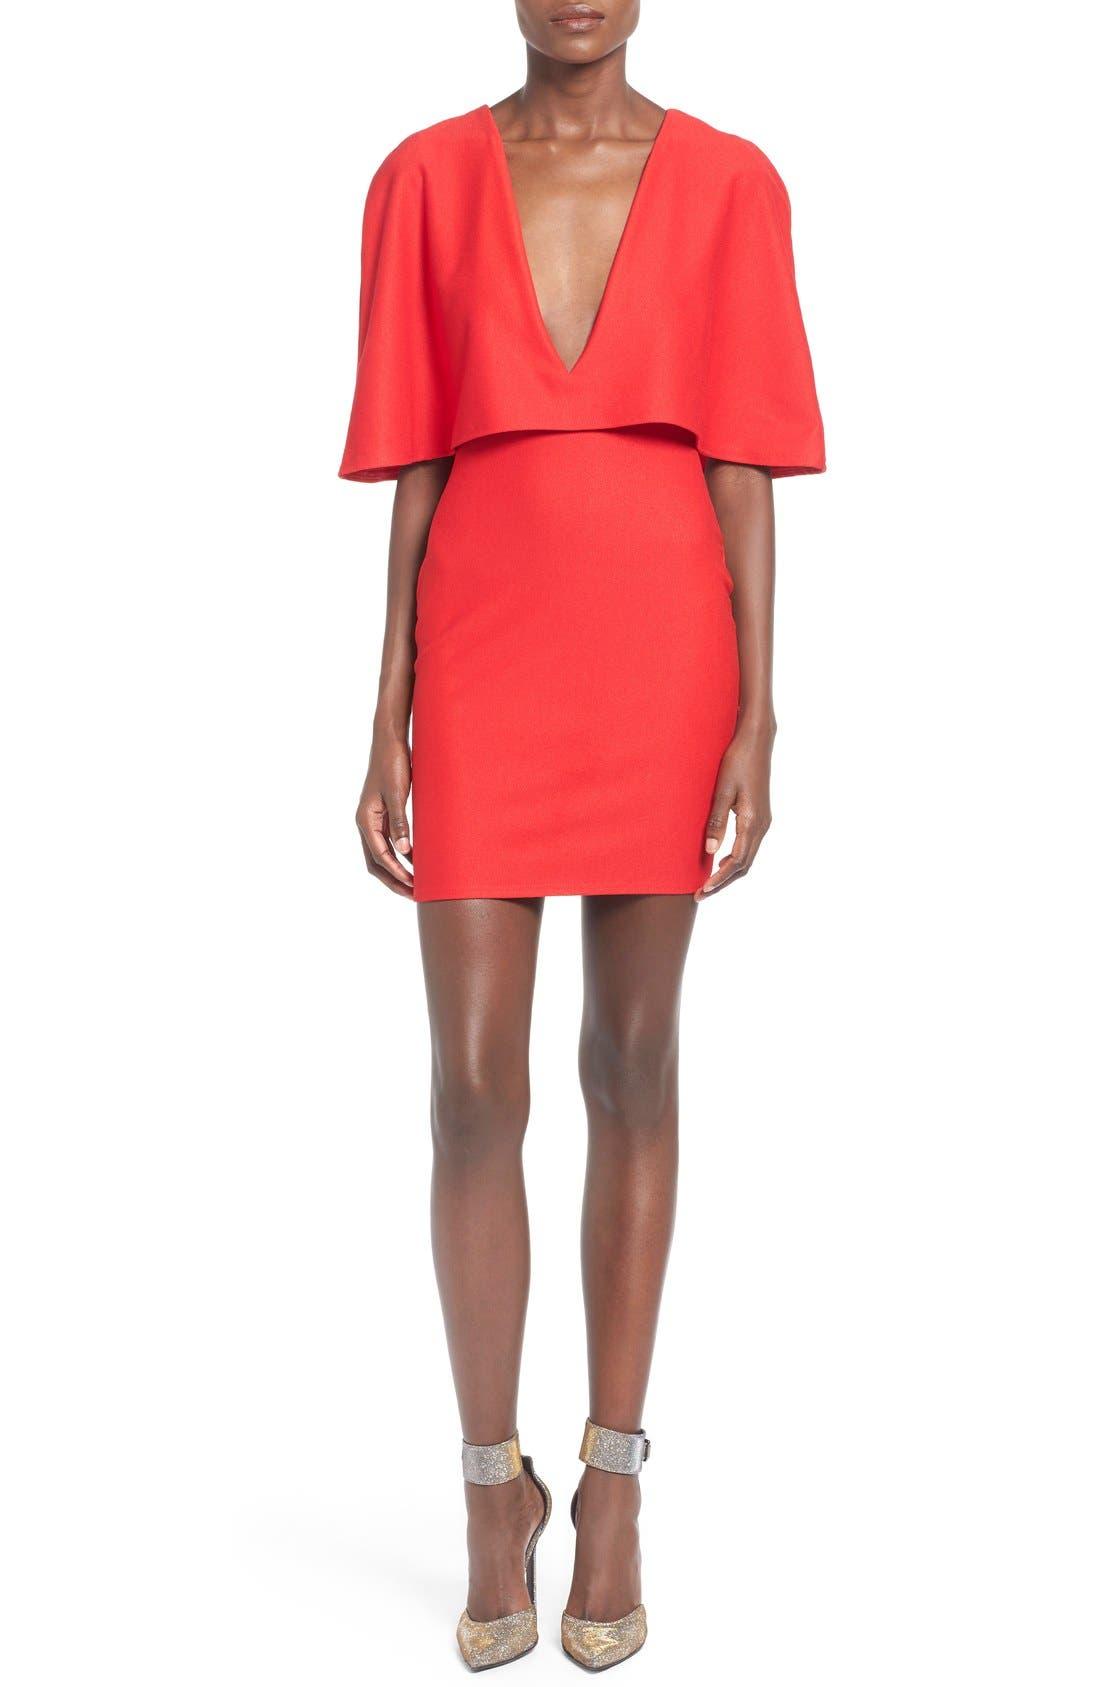 Main Image - Missguided Cape Body-Con Dress